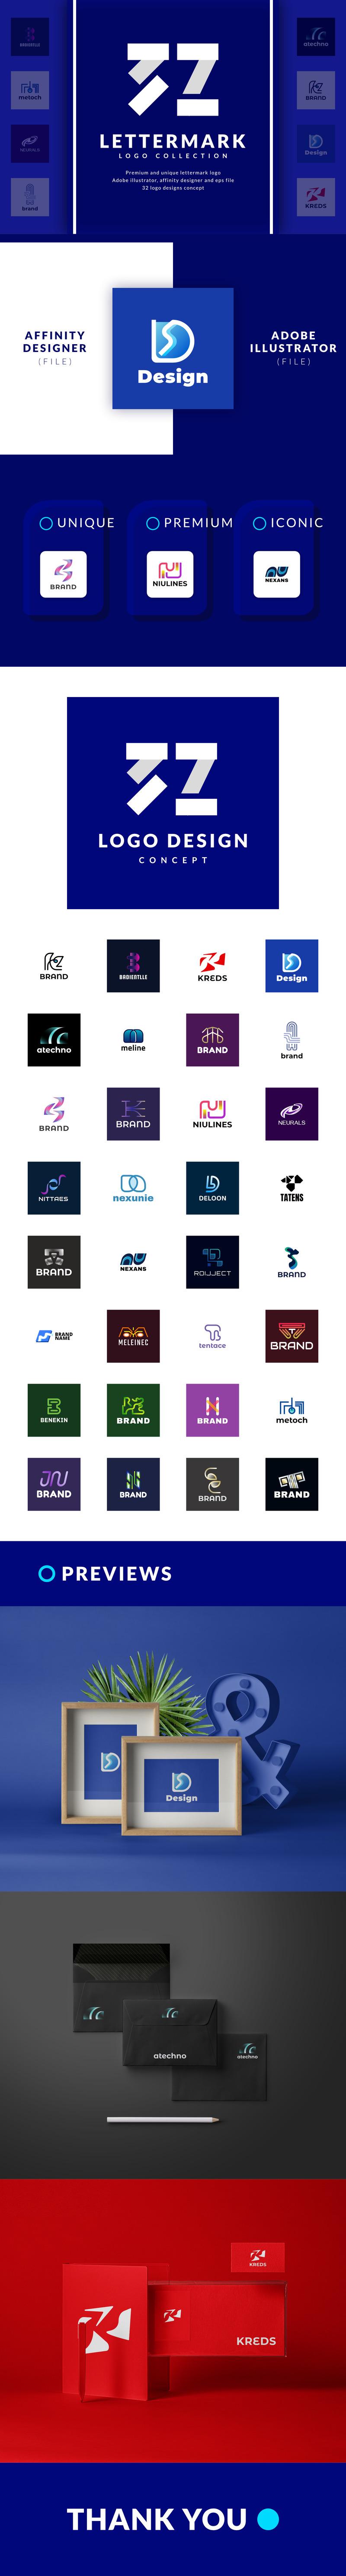 32 Lettermark Logo Collection - 2315524 1603317249702 presentation